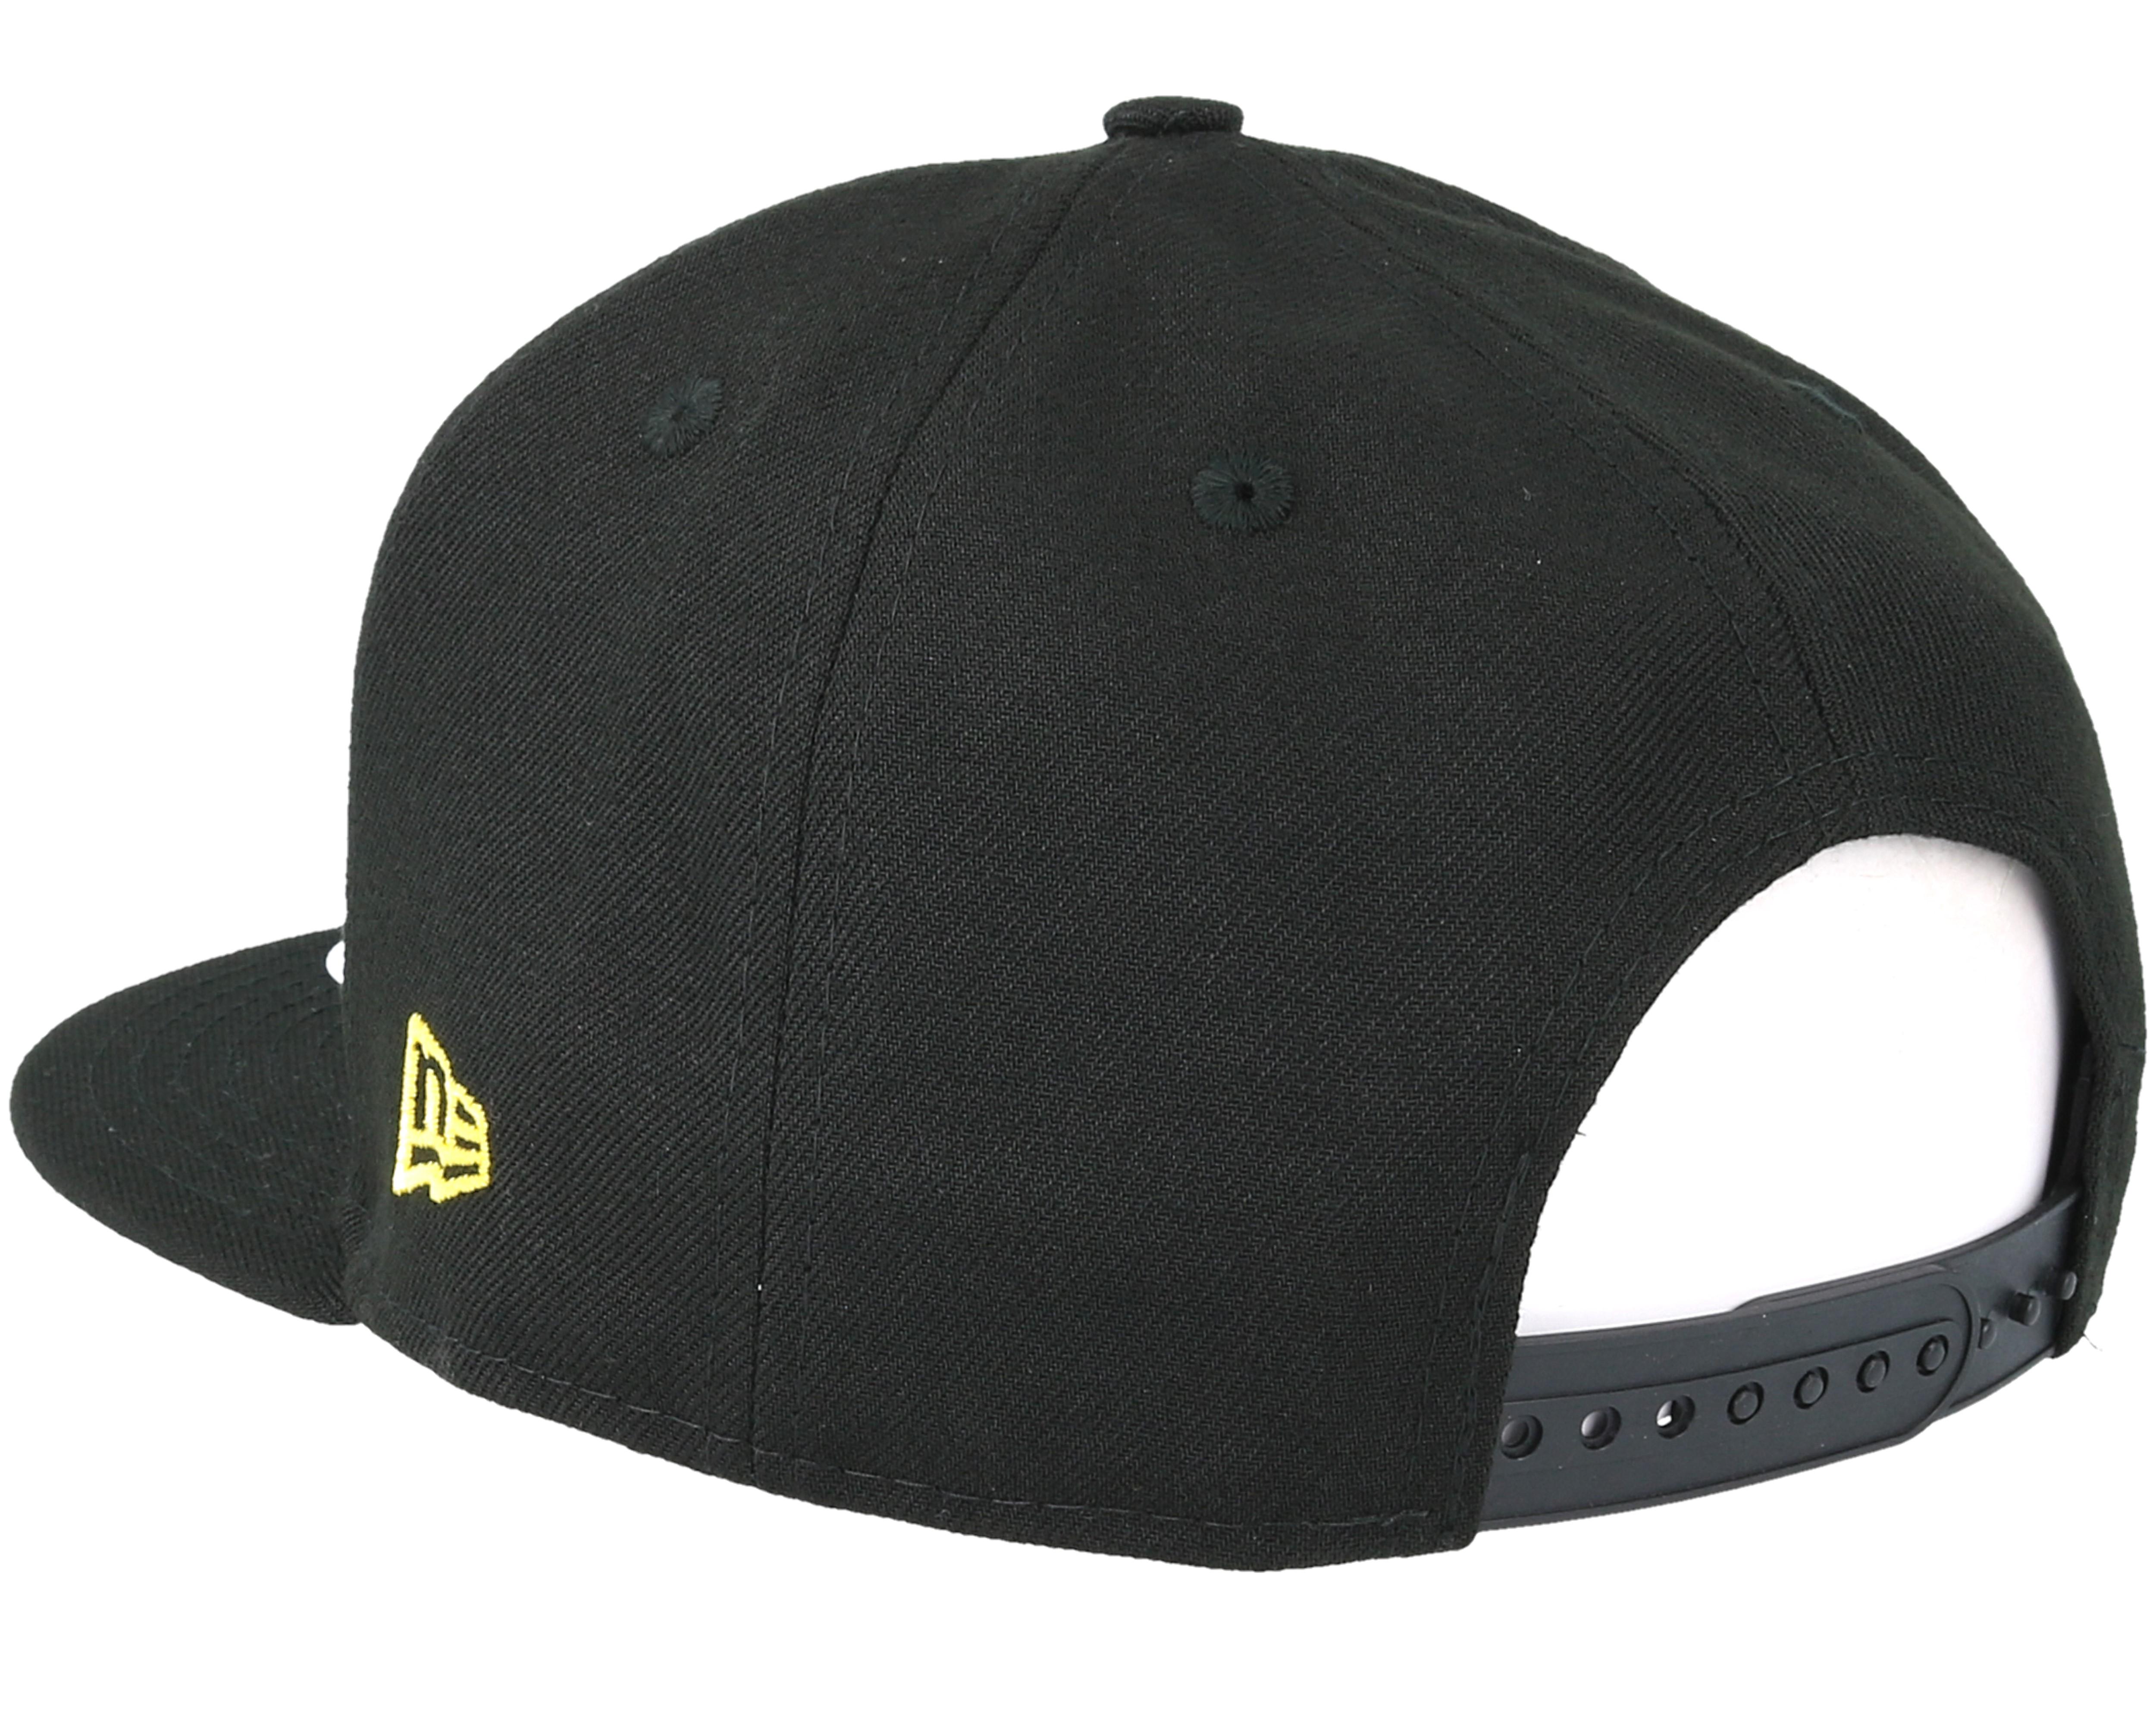 batman team gitd basic 9fifty black snapback new era cap. Black Bedroom Furniture Sets. Home Design Ideas